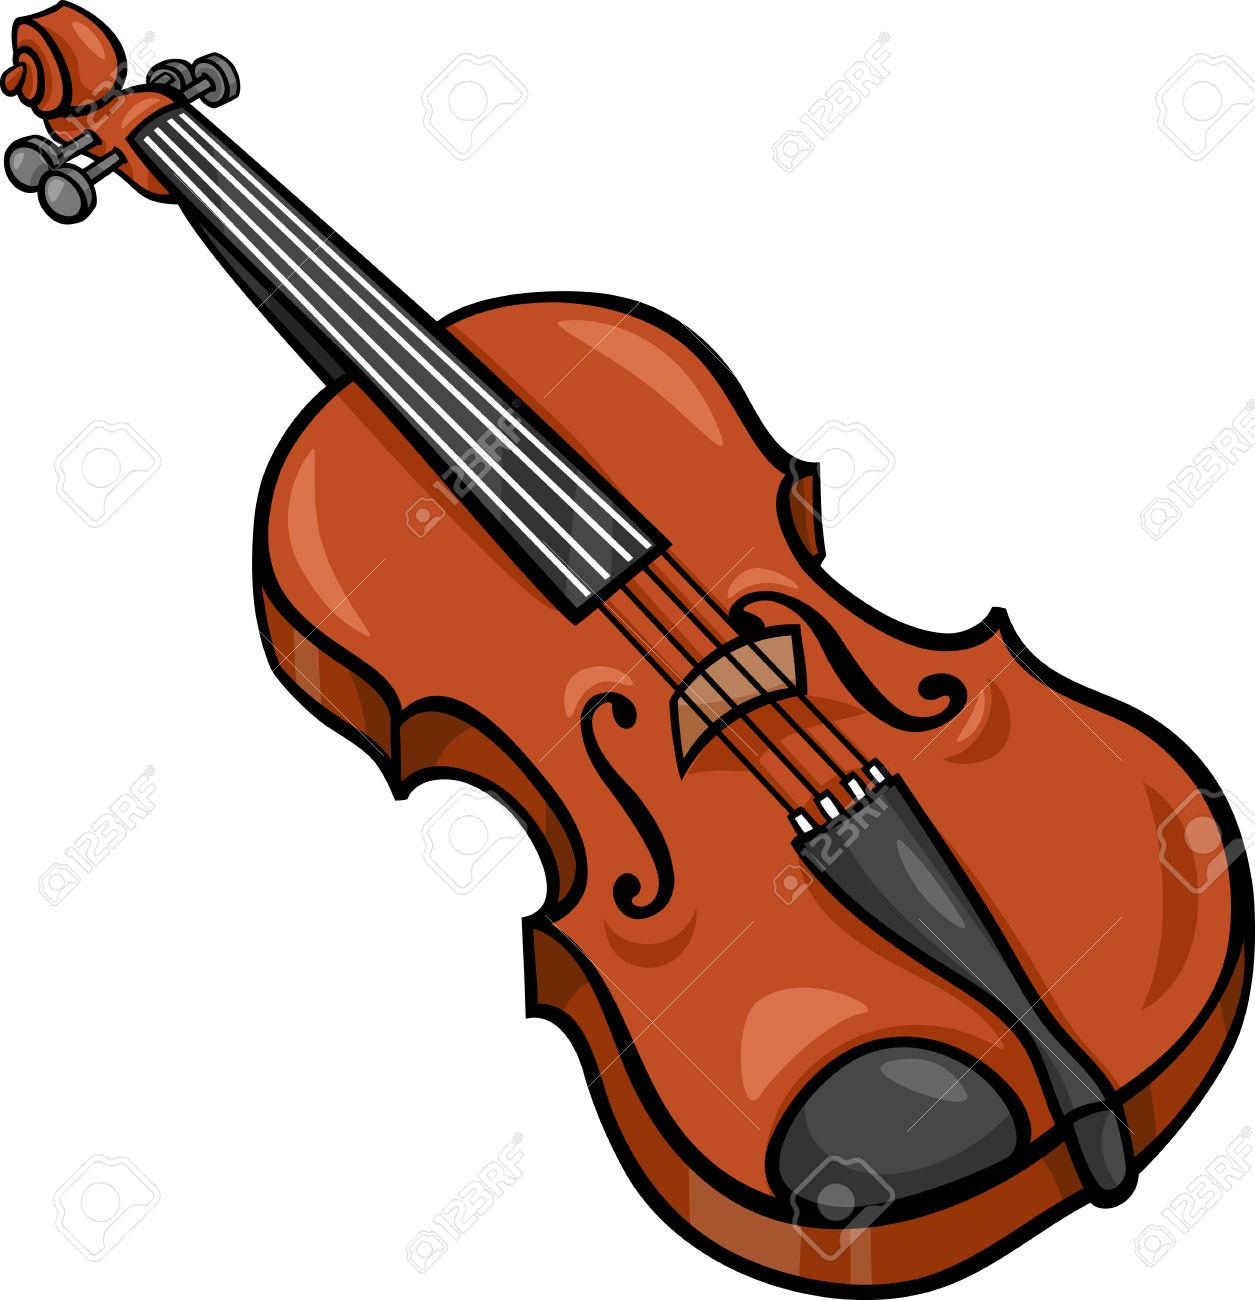 Violin clipart (4879) Violin Clipart Clipart Violin